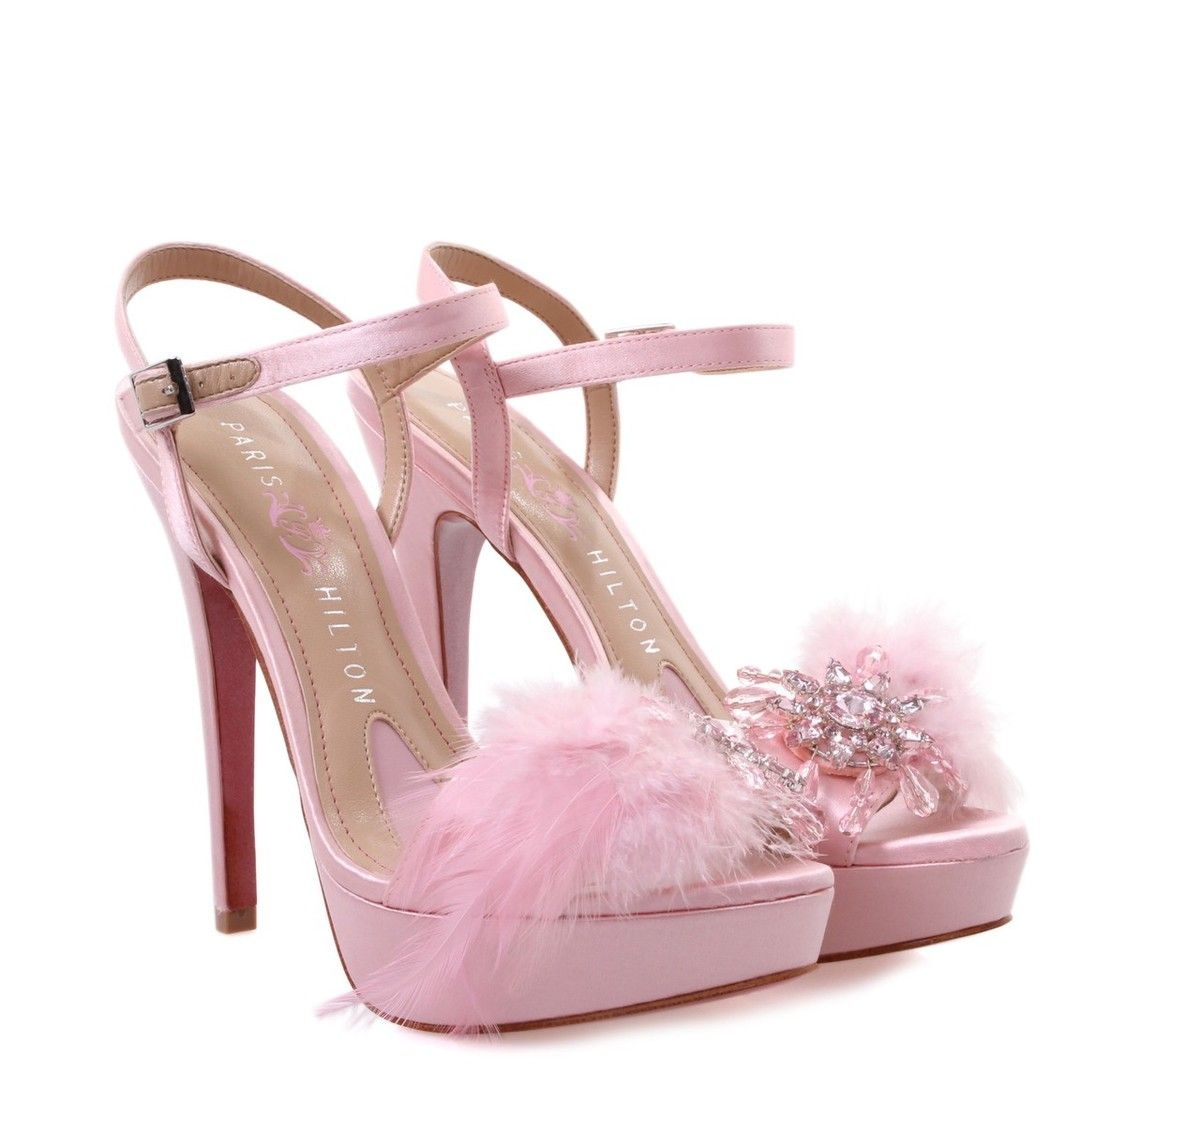 05fc8fb9c30 PARIS HILTON Pink Bridal Satin High-heeled Sandals. Γυναικεία ροζ σατέν  νυφικά πέδιλα.